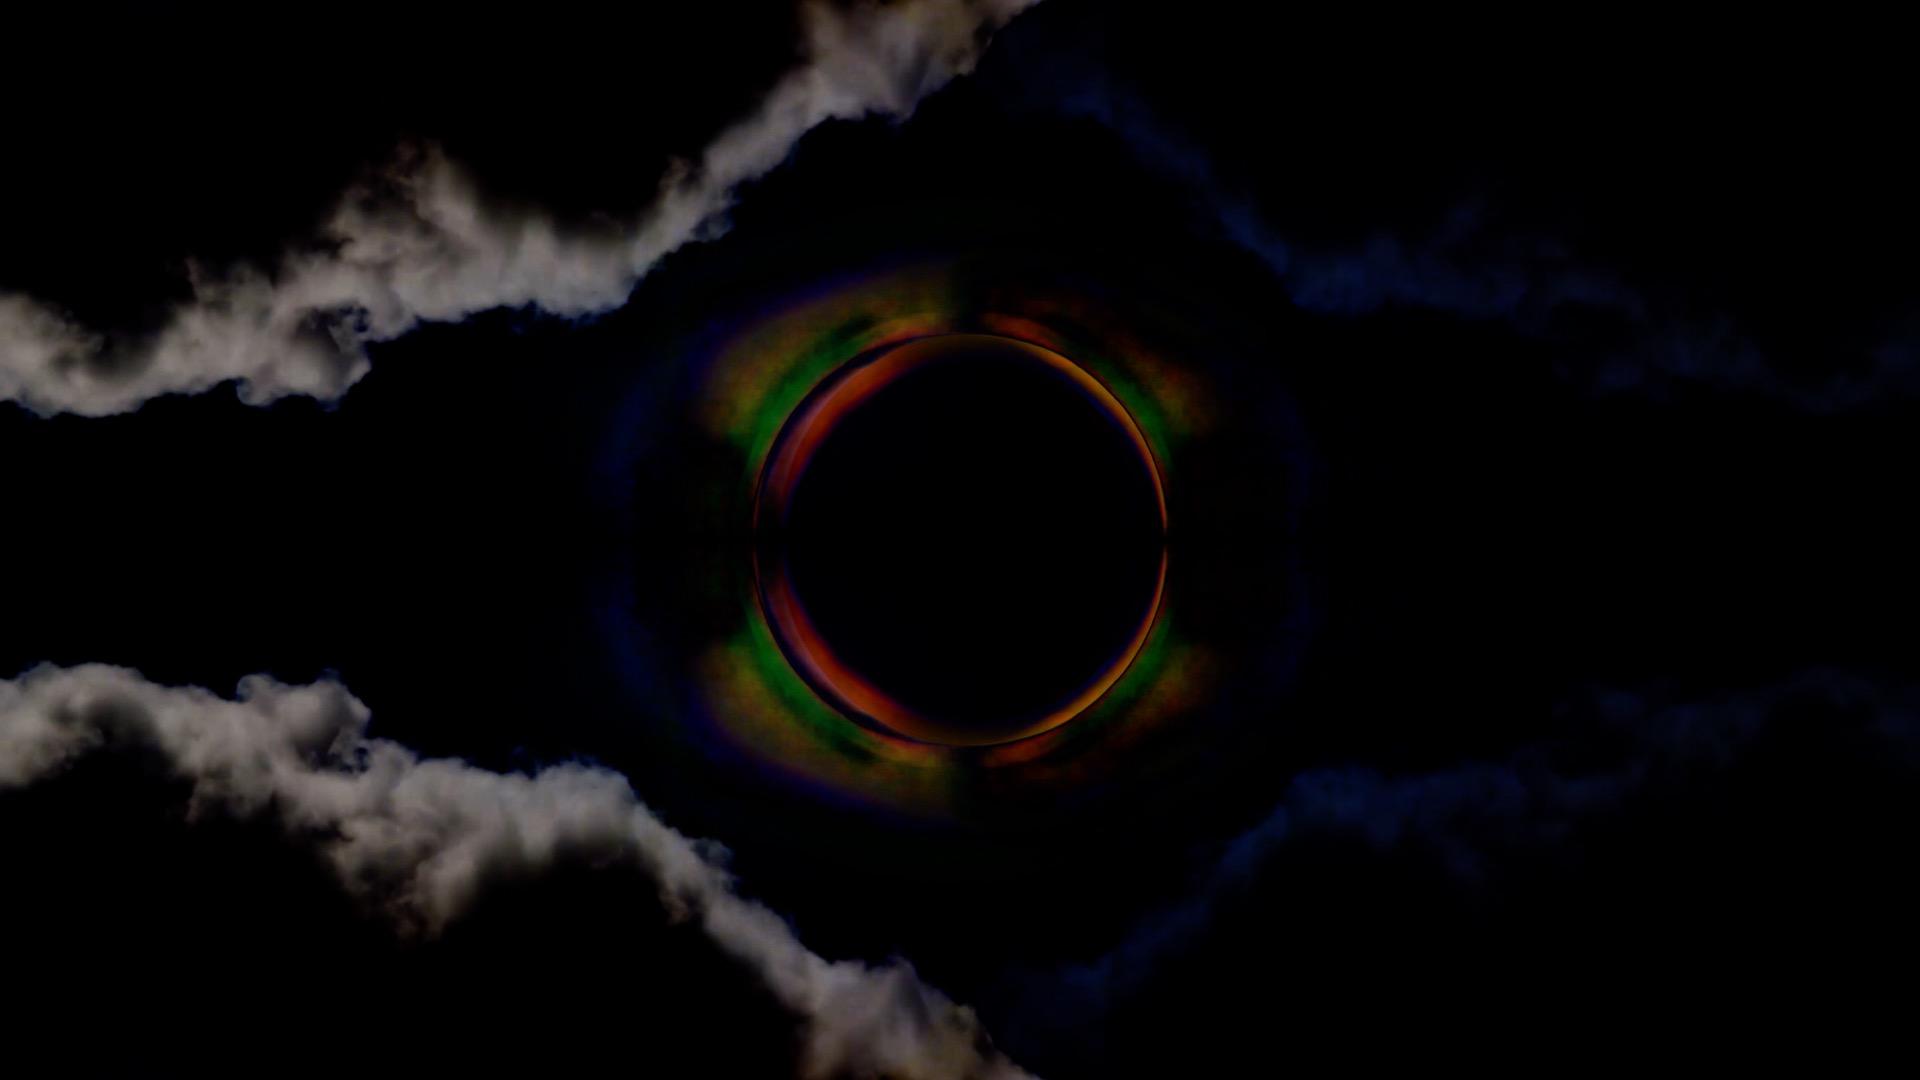 PREVIEW 1. HEAVEN - II. Solar Eclipse 1.jpg